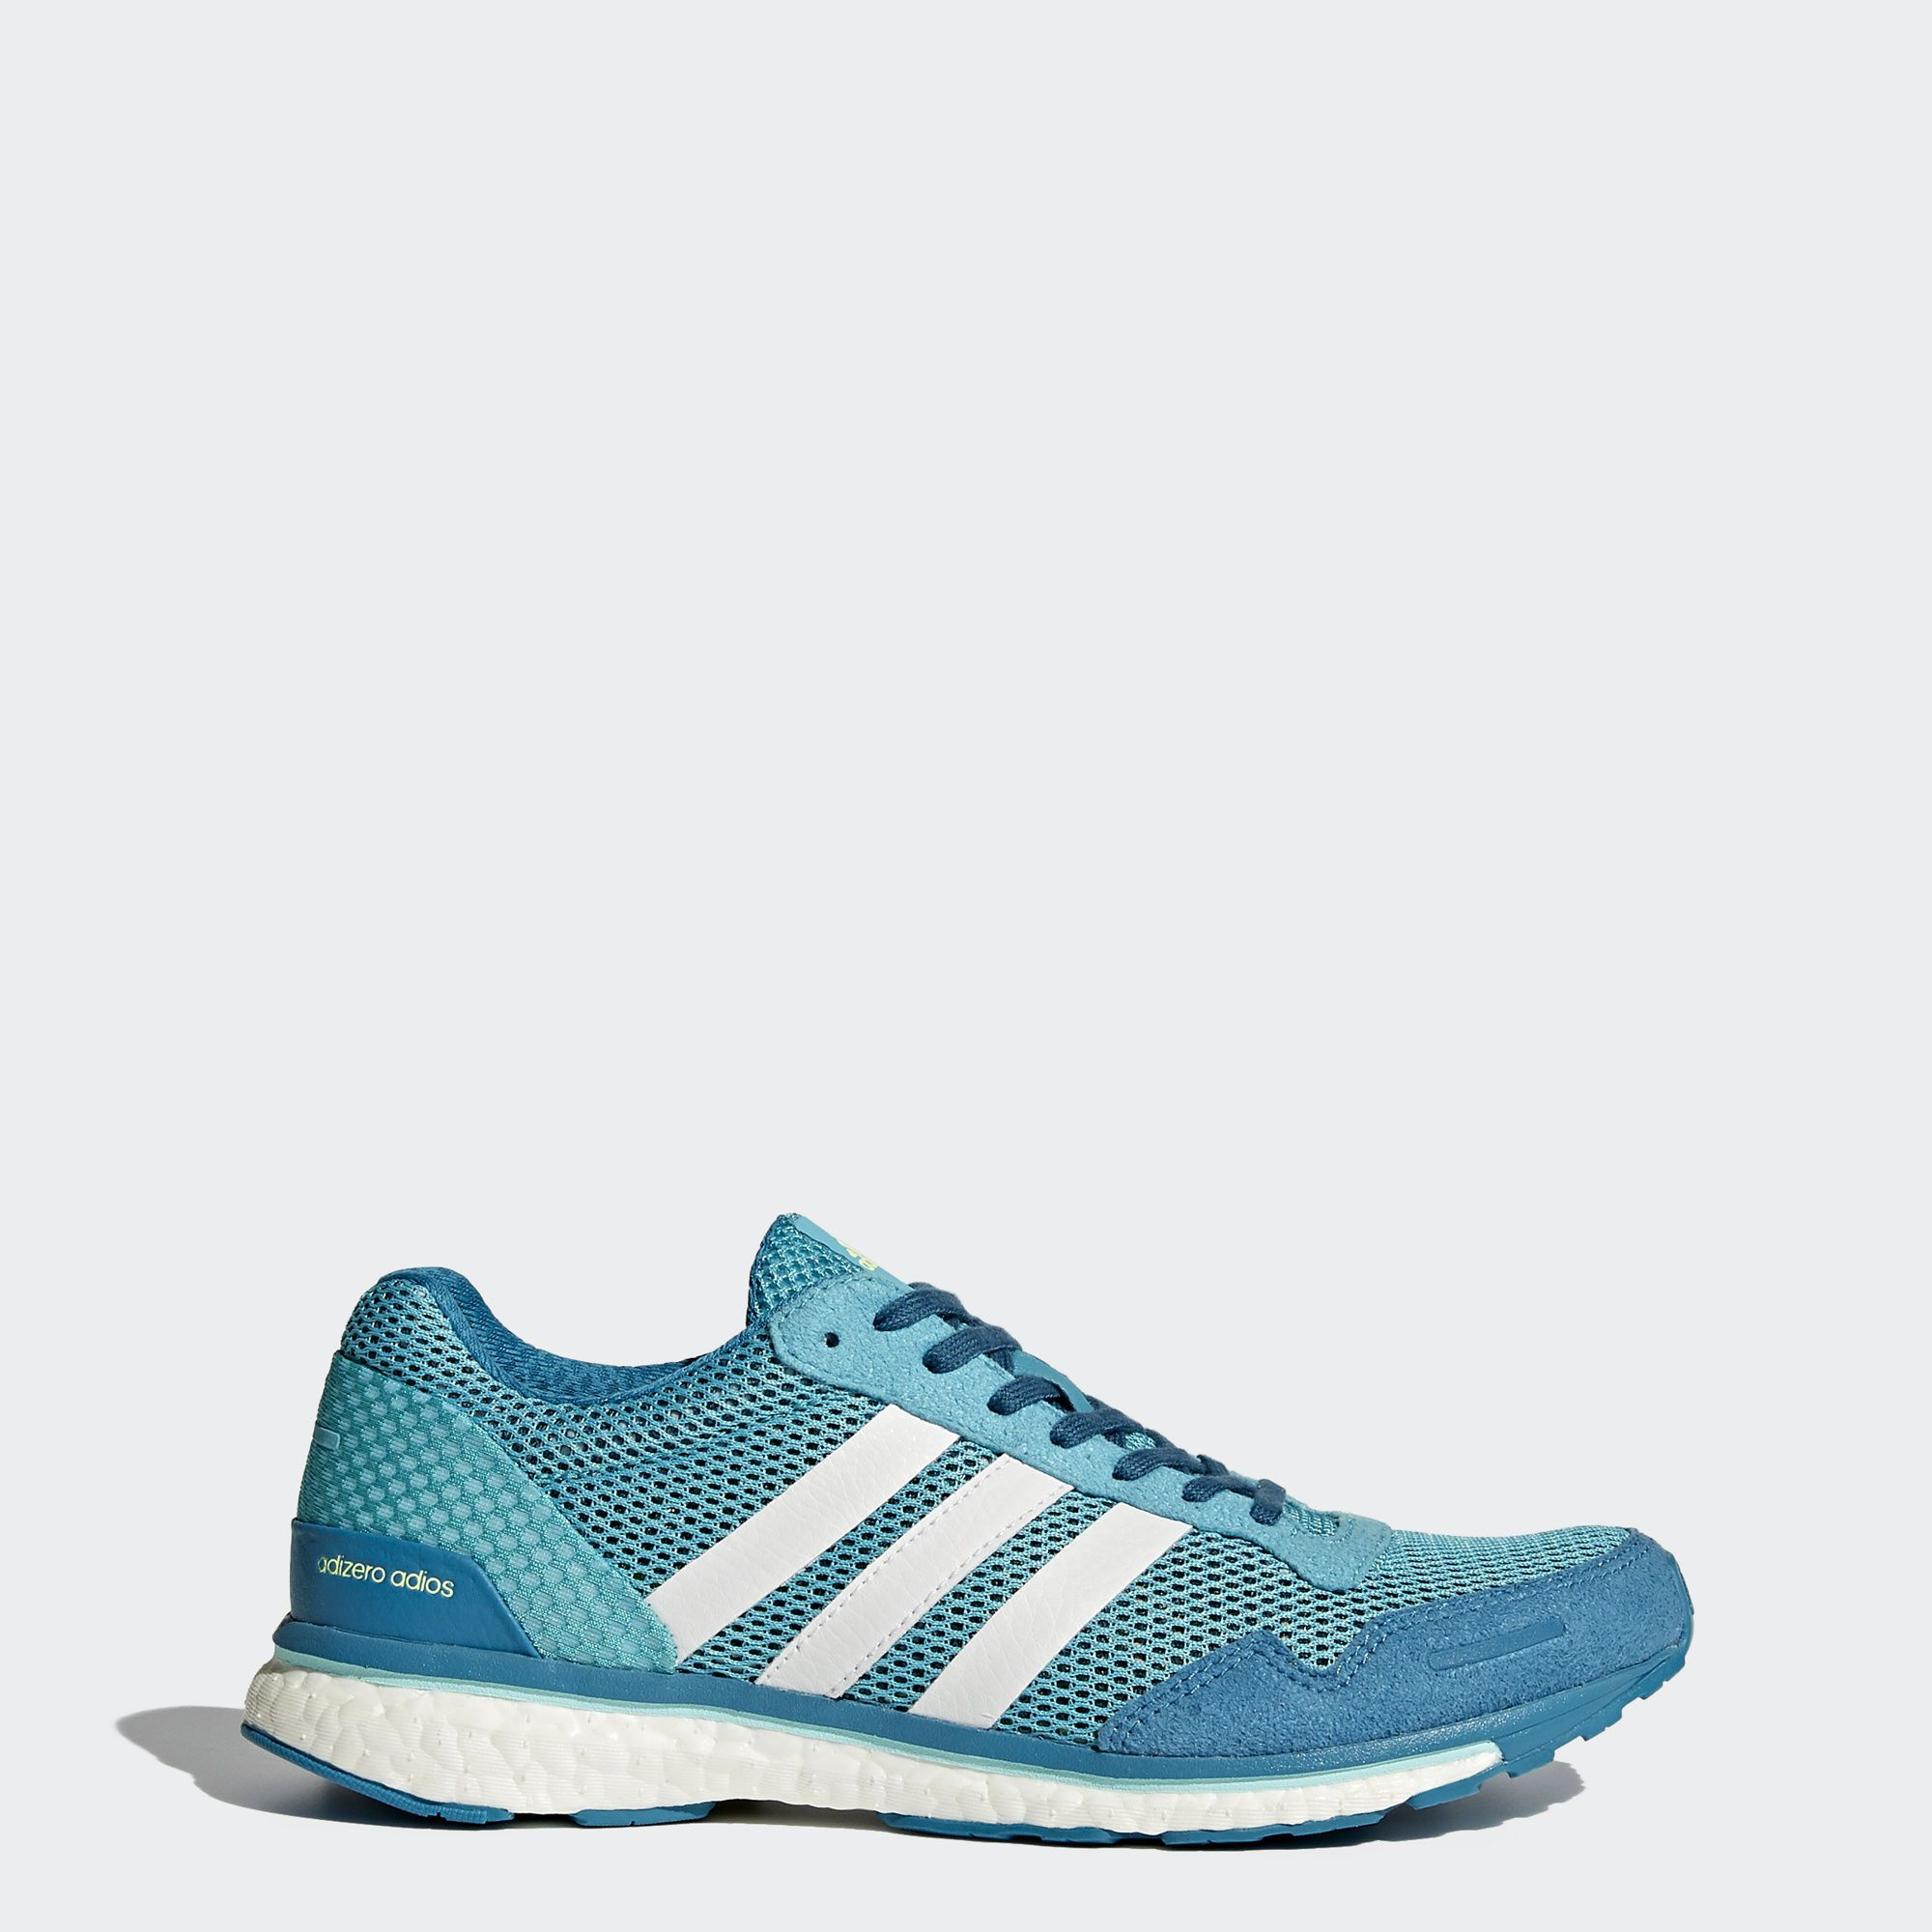 Tenis adidas Adizero Adios Boost 3 Negro Azul Correr Running